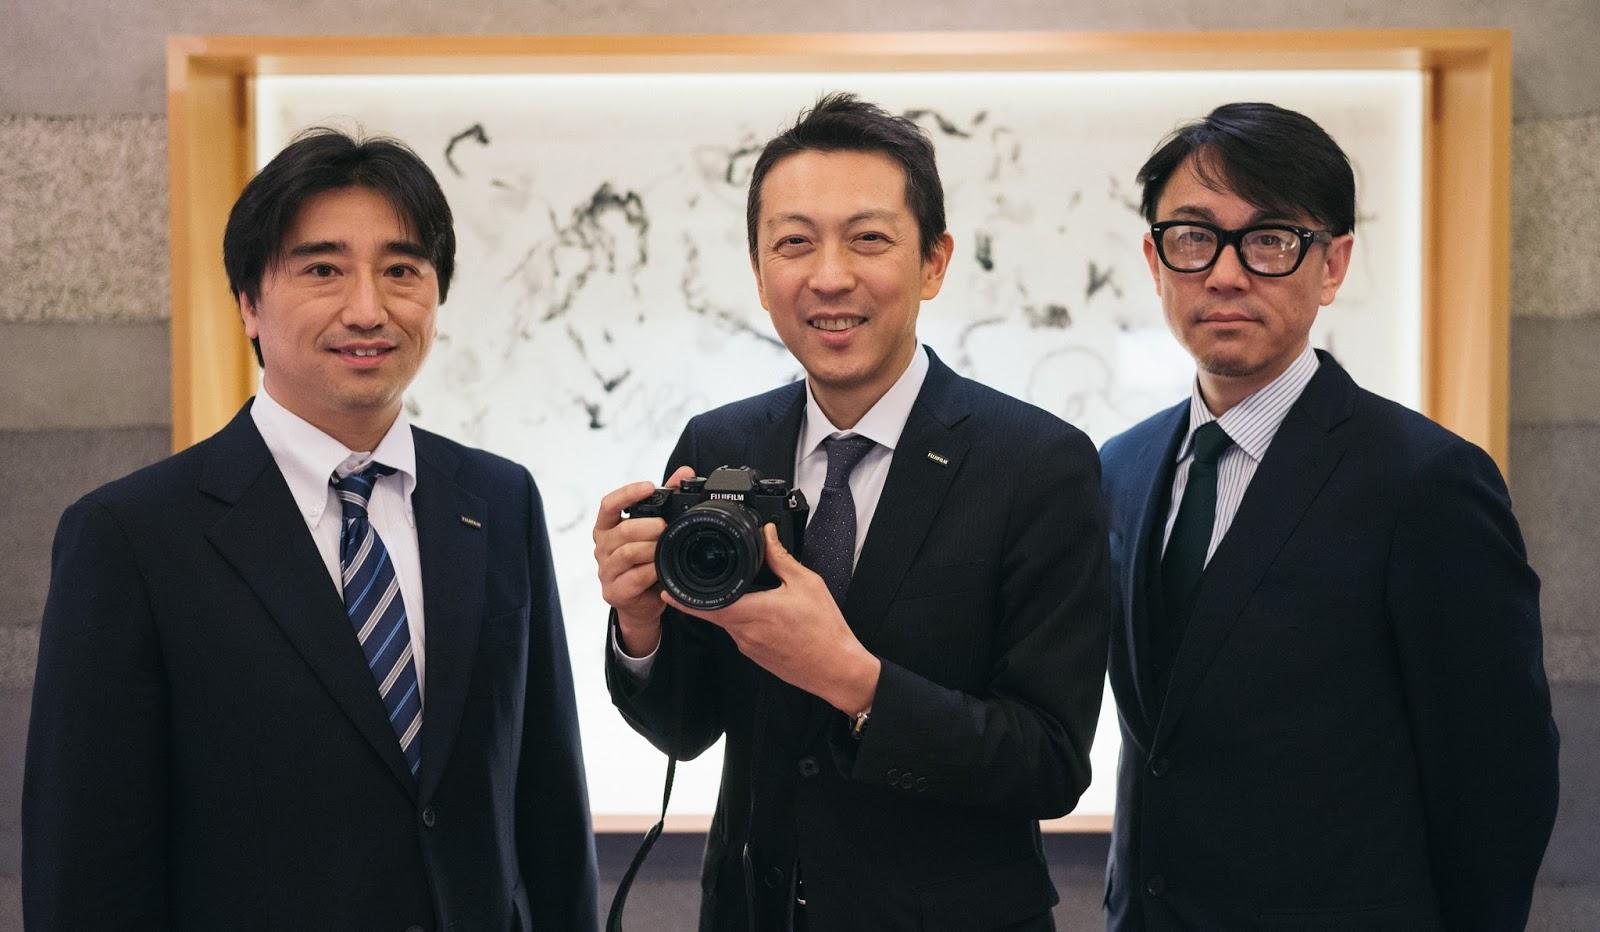 Менеджеры Fujifilm: Тошихиса Исила, Макото Оиши и Шин Удоно